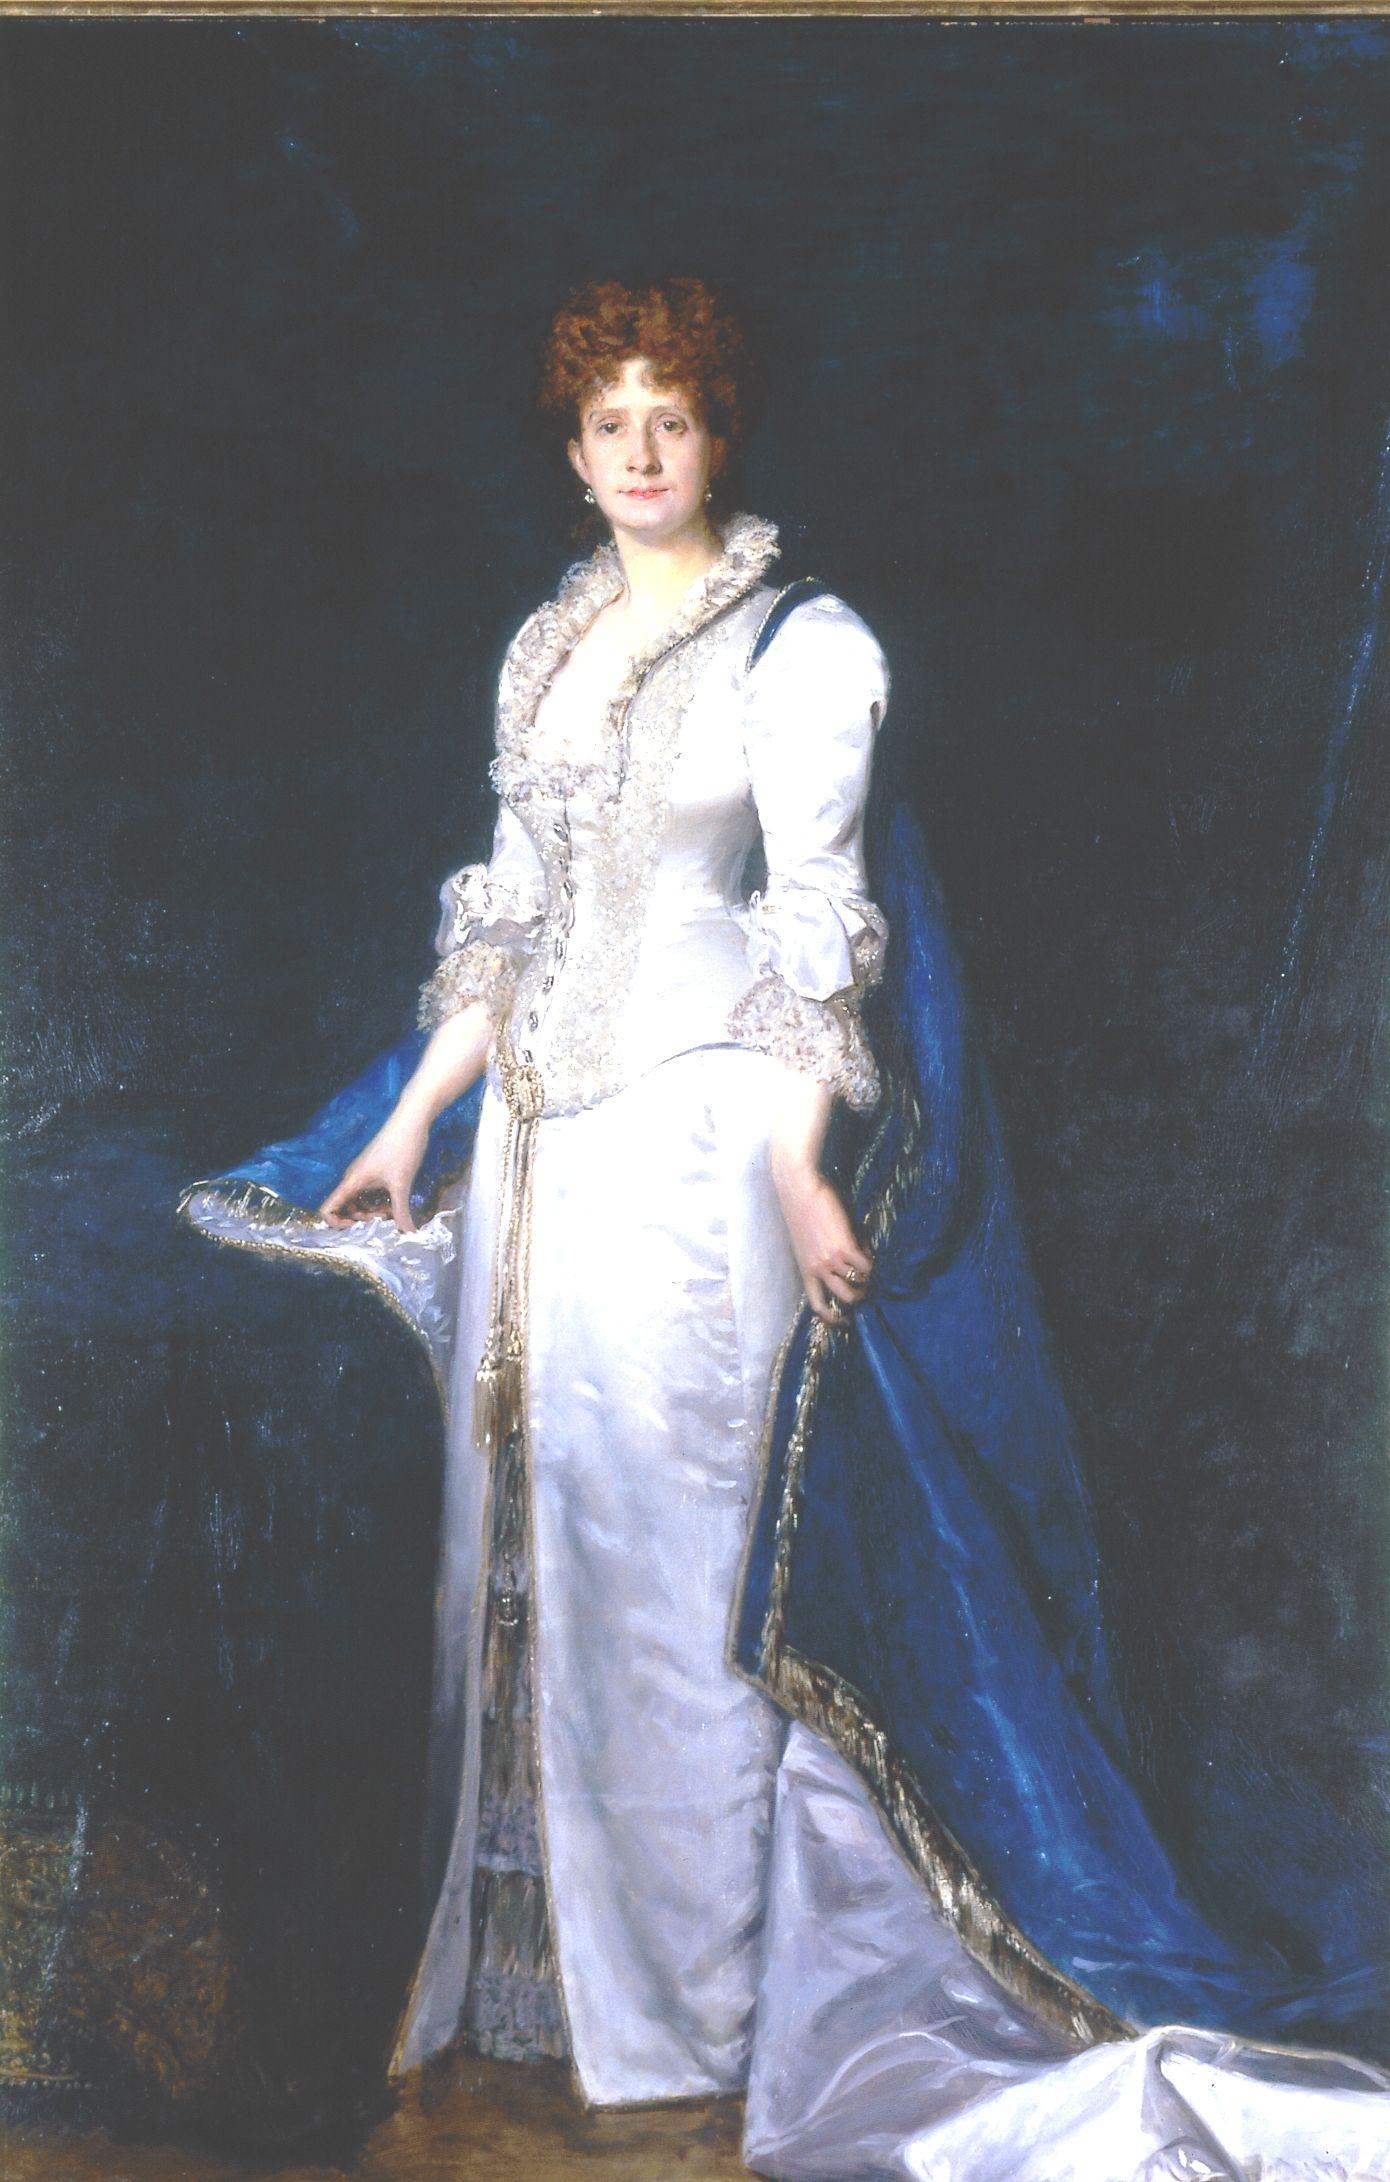 Portrait of Queen Maria Pia by Carolus-Duran, 1880 http://www.matriznet.dgpc.pt/MatrizNet/Objectos/ObjectosConsultar.aspx?IdReg=990563&EntSep=5#gotoPosition